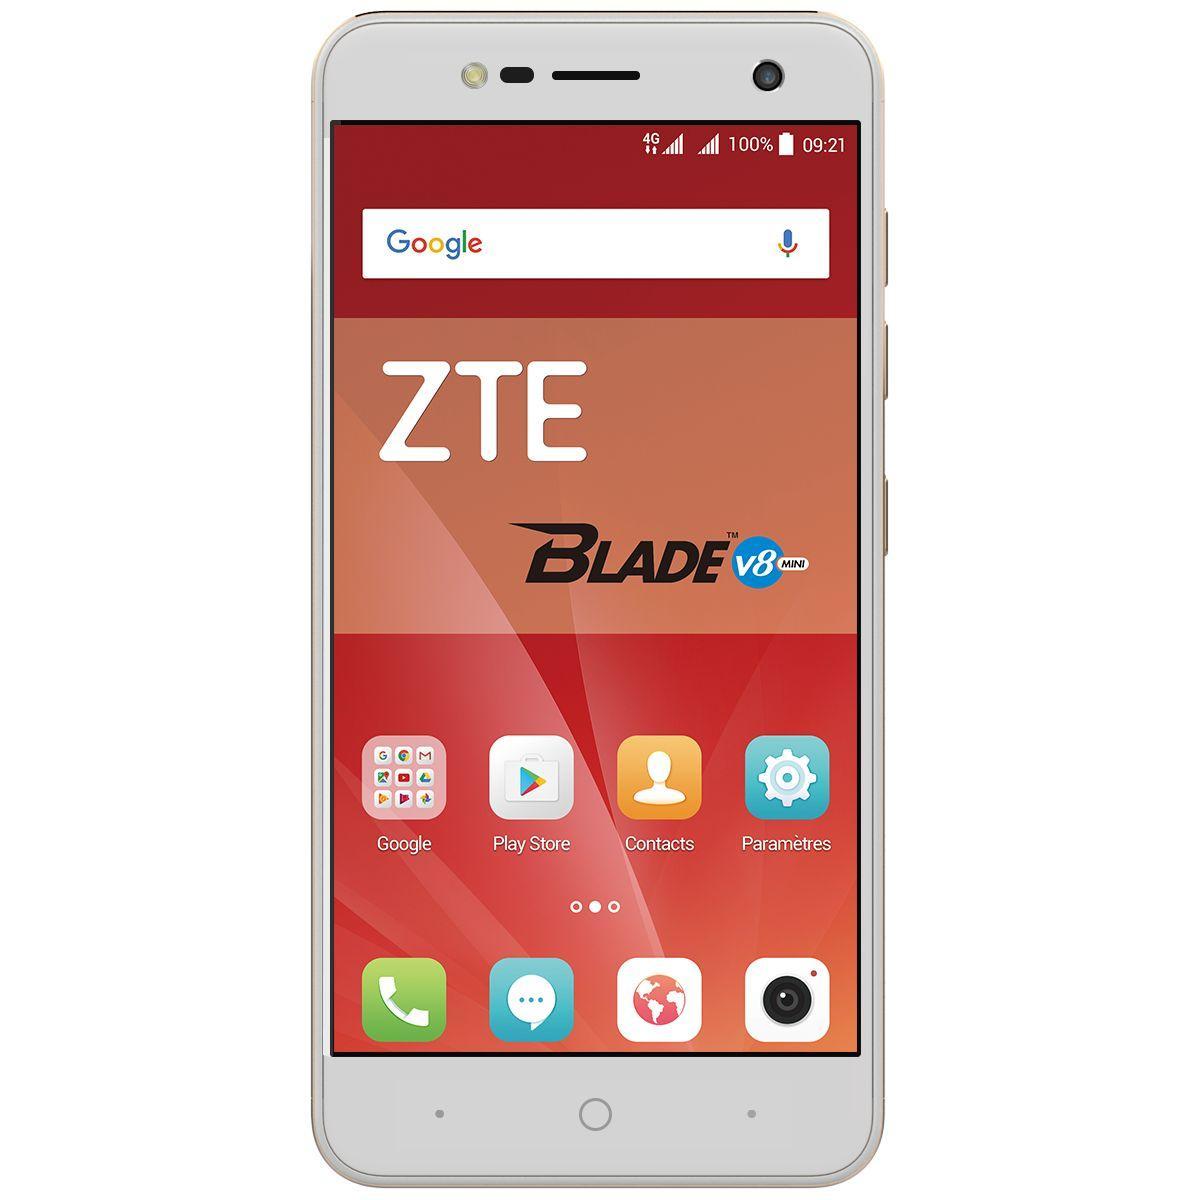 Smartphone zte blade v8 gold for Coque zte blade a610 plus